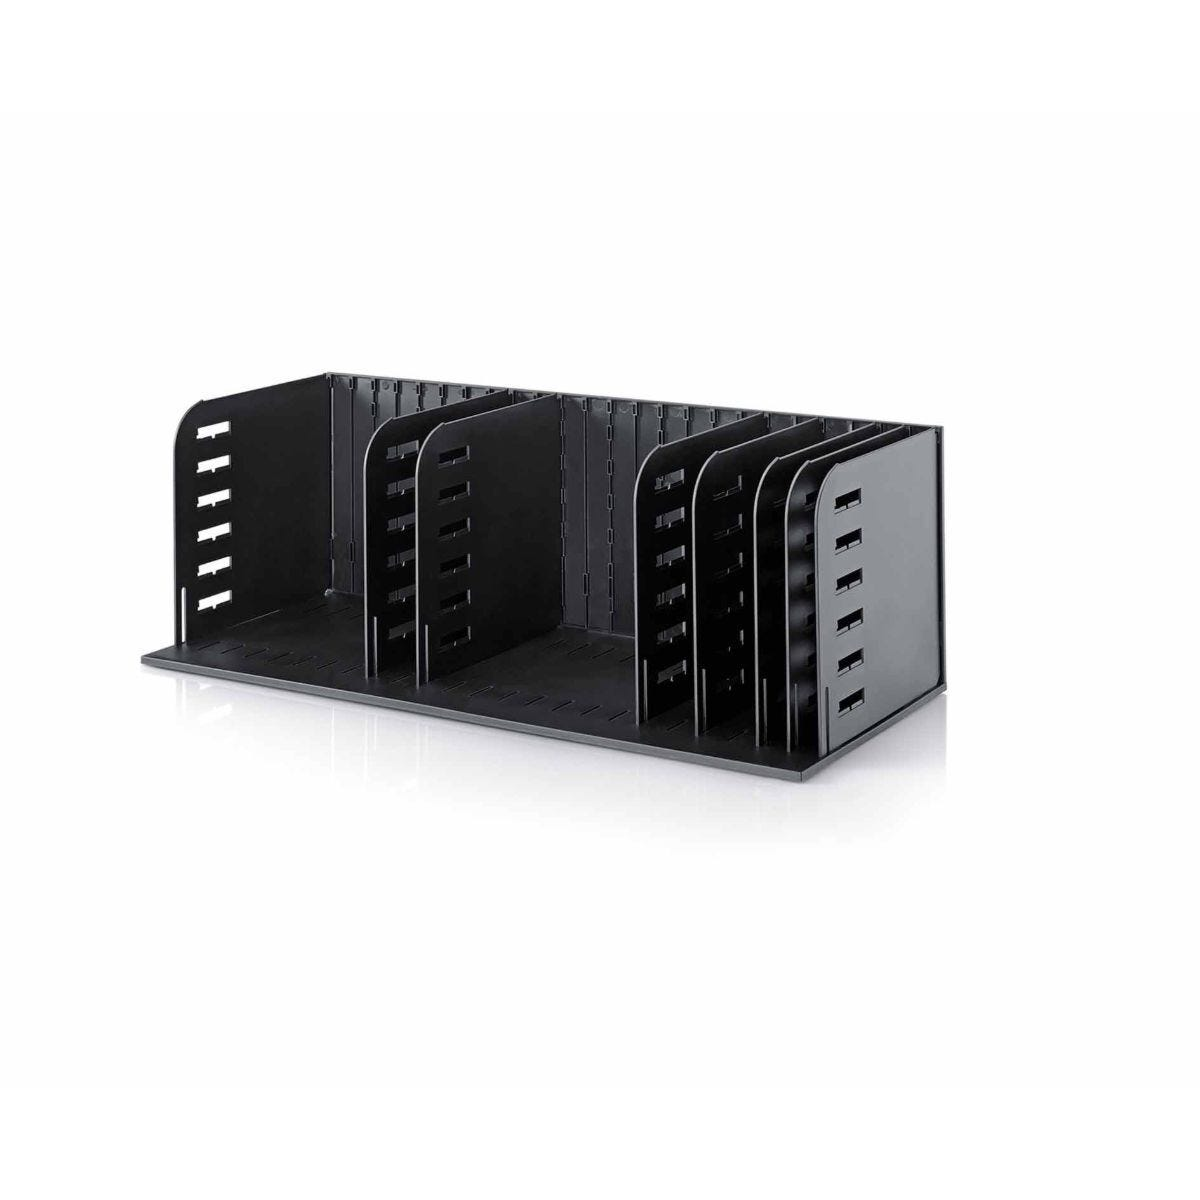 Styrorac Vertical Desktop Organiser 8 Compartments